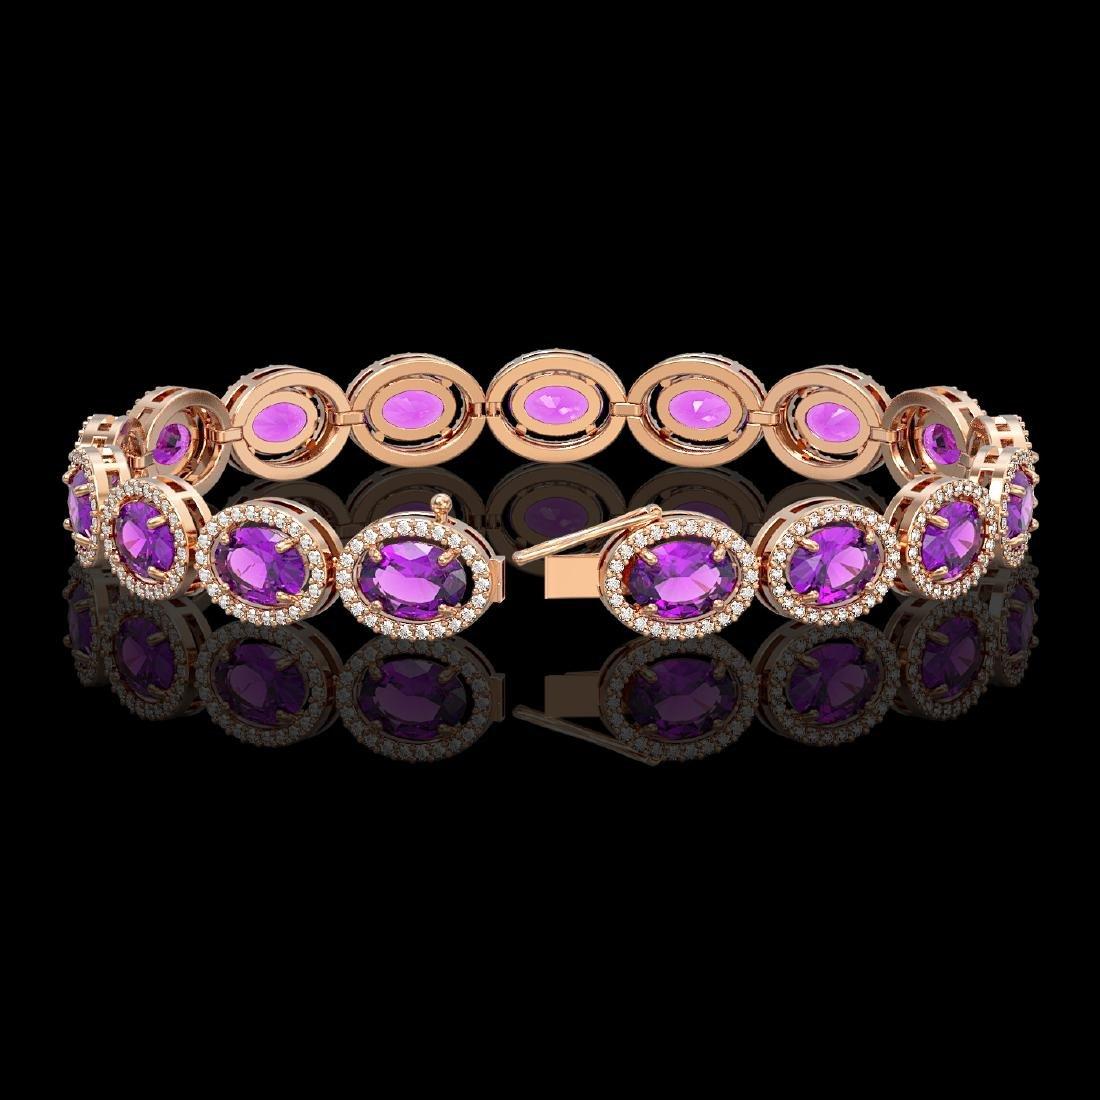 19.82 CTW Amethyst & Diamond Halo Bracelet 10K Rose - 2